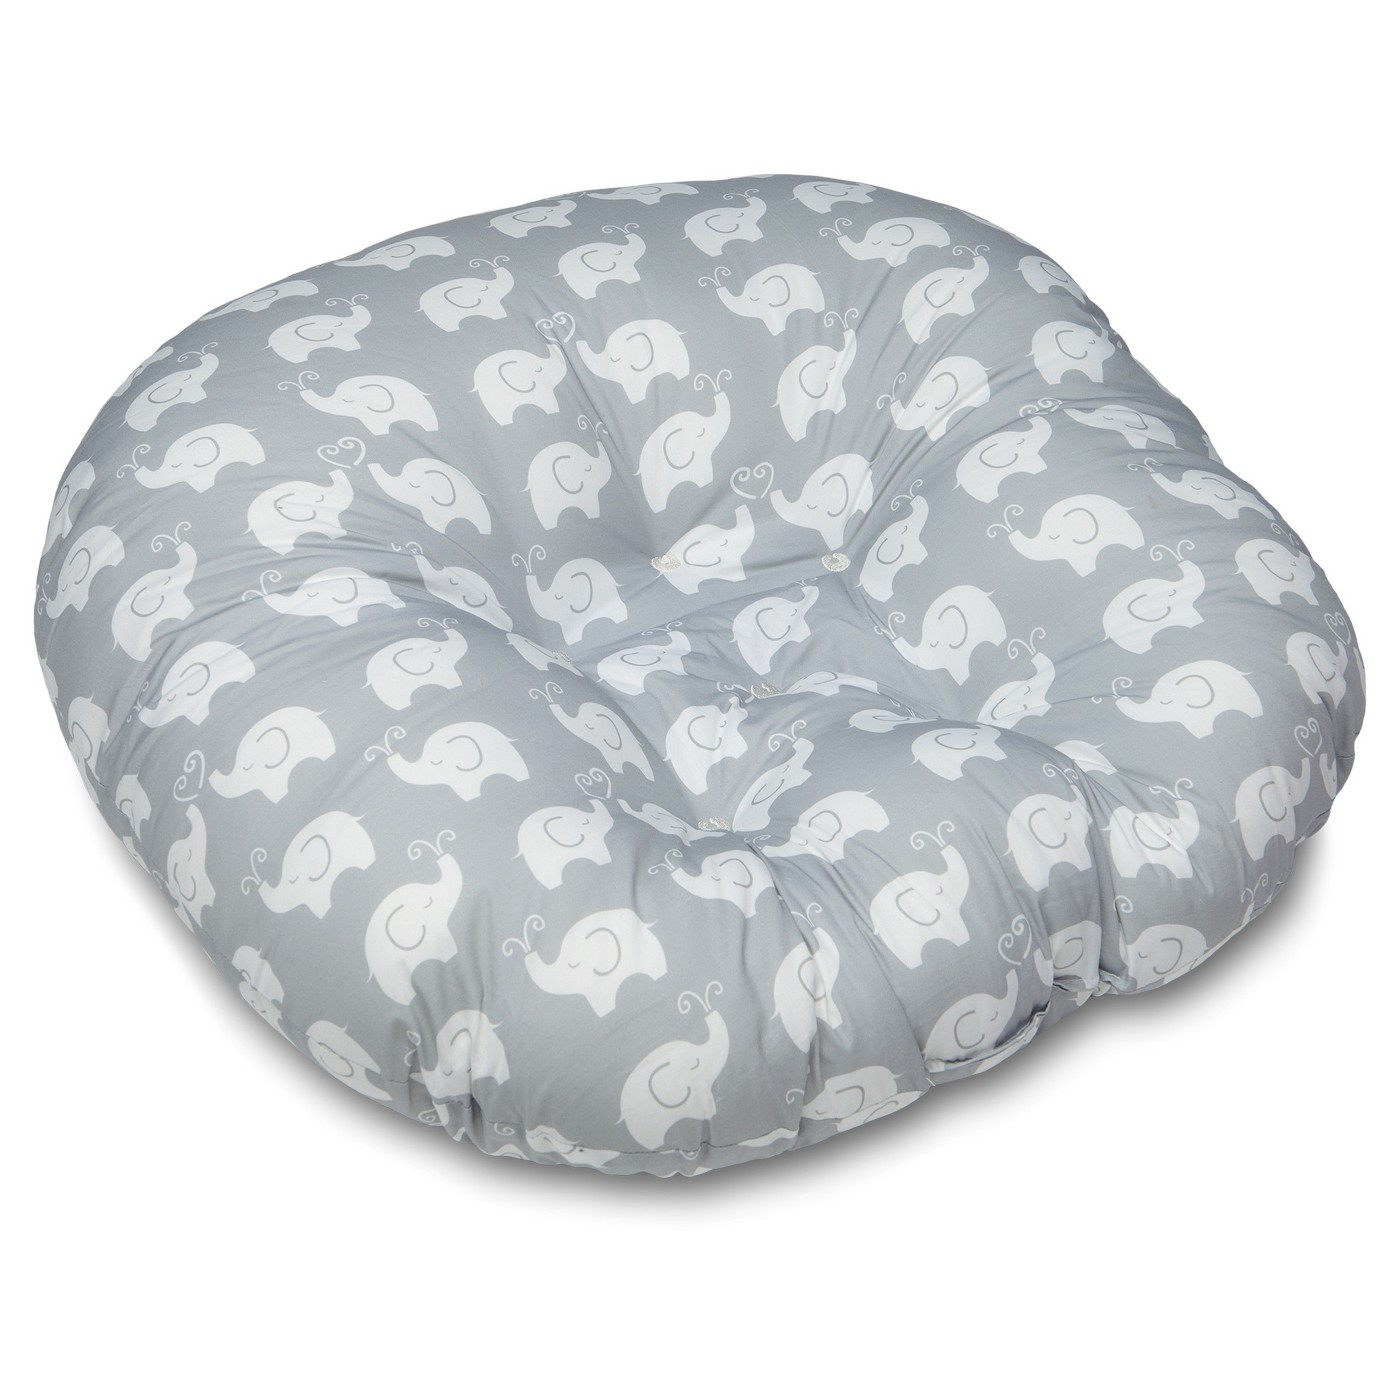 Newborn Lounger - Elephant Love Gray - $29.99